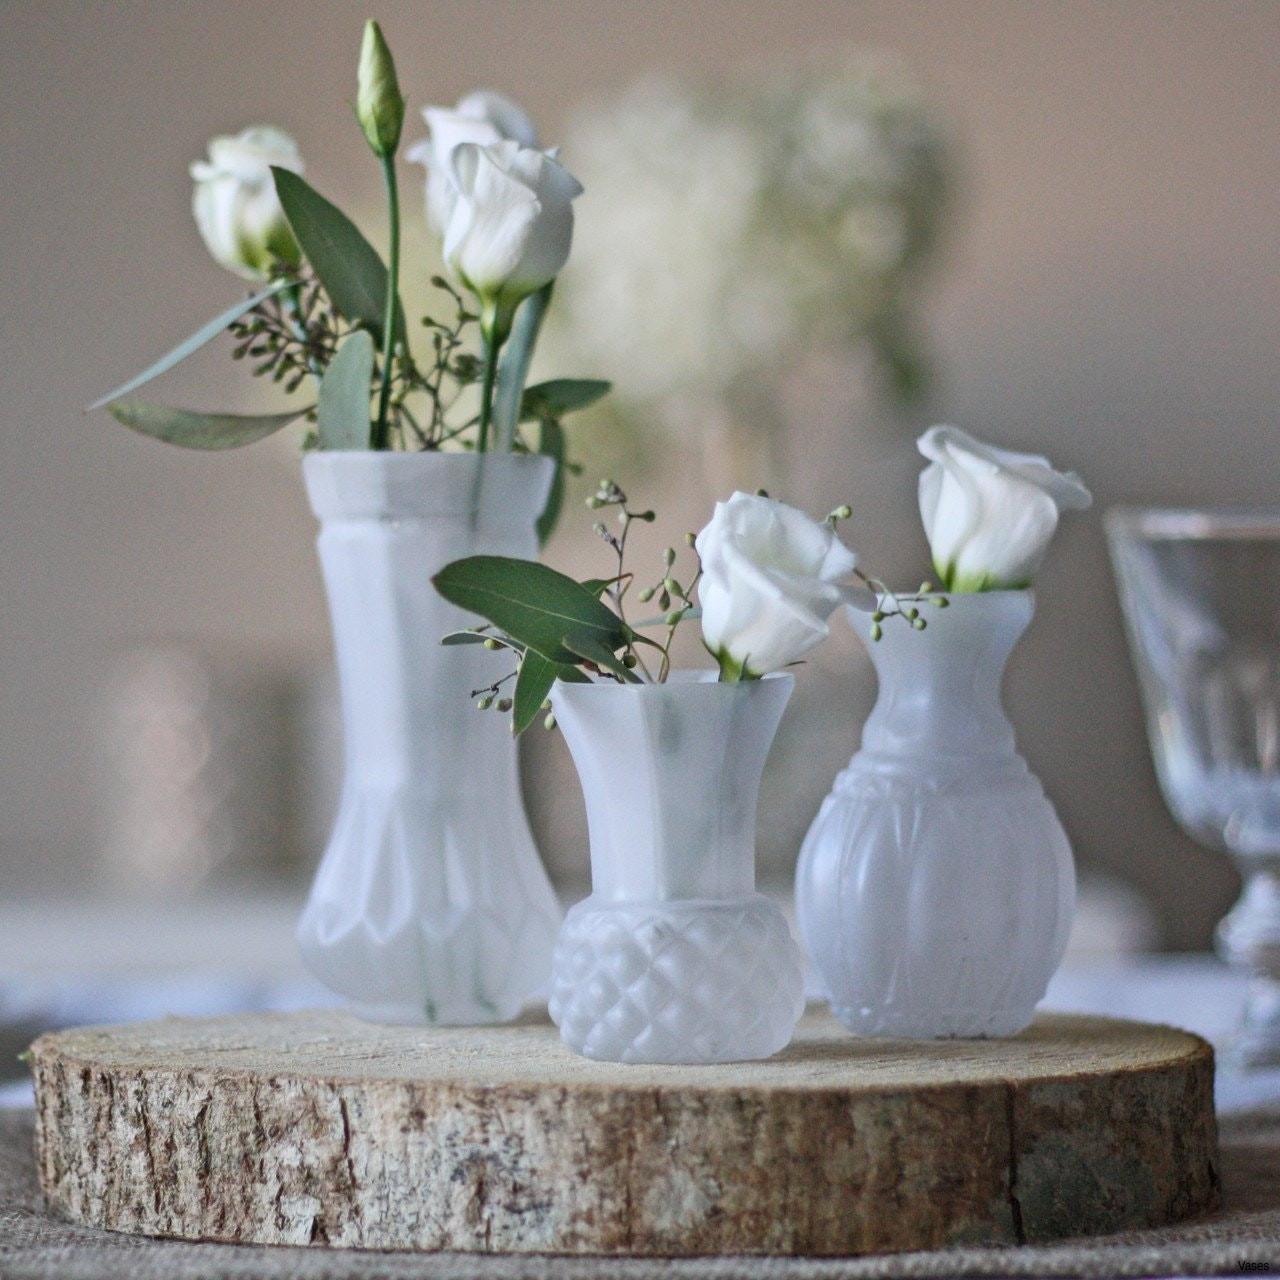 donate glass flower vases of glass jar vase gallery jar flower 1h vases bud wedding vase within glass jar vase gallery jar flower 1h vases bud wedding vase centerpiece idea i 0d white